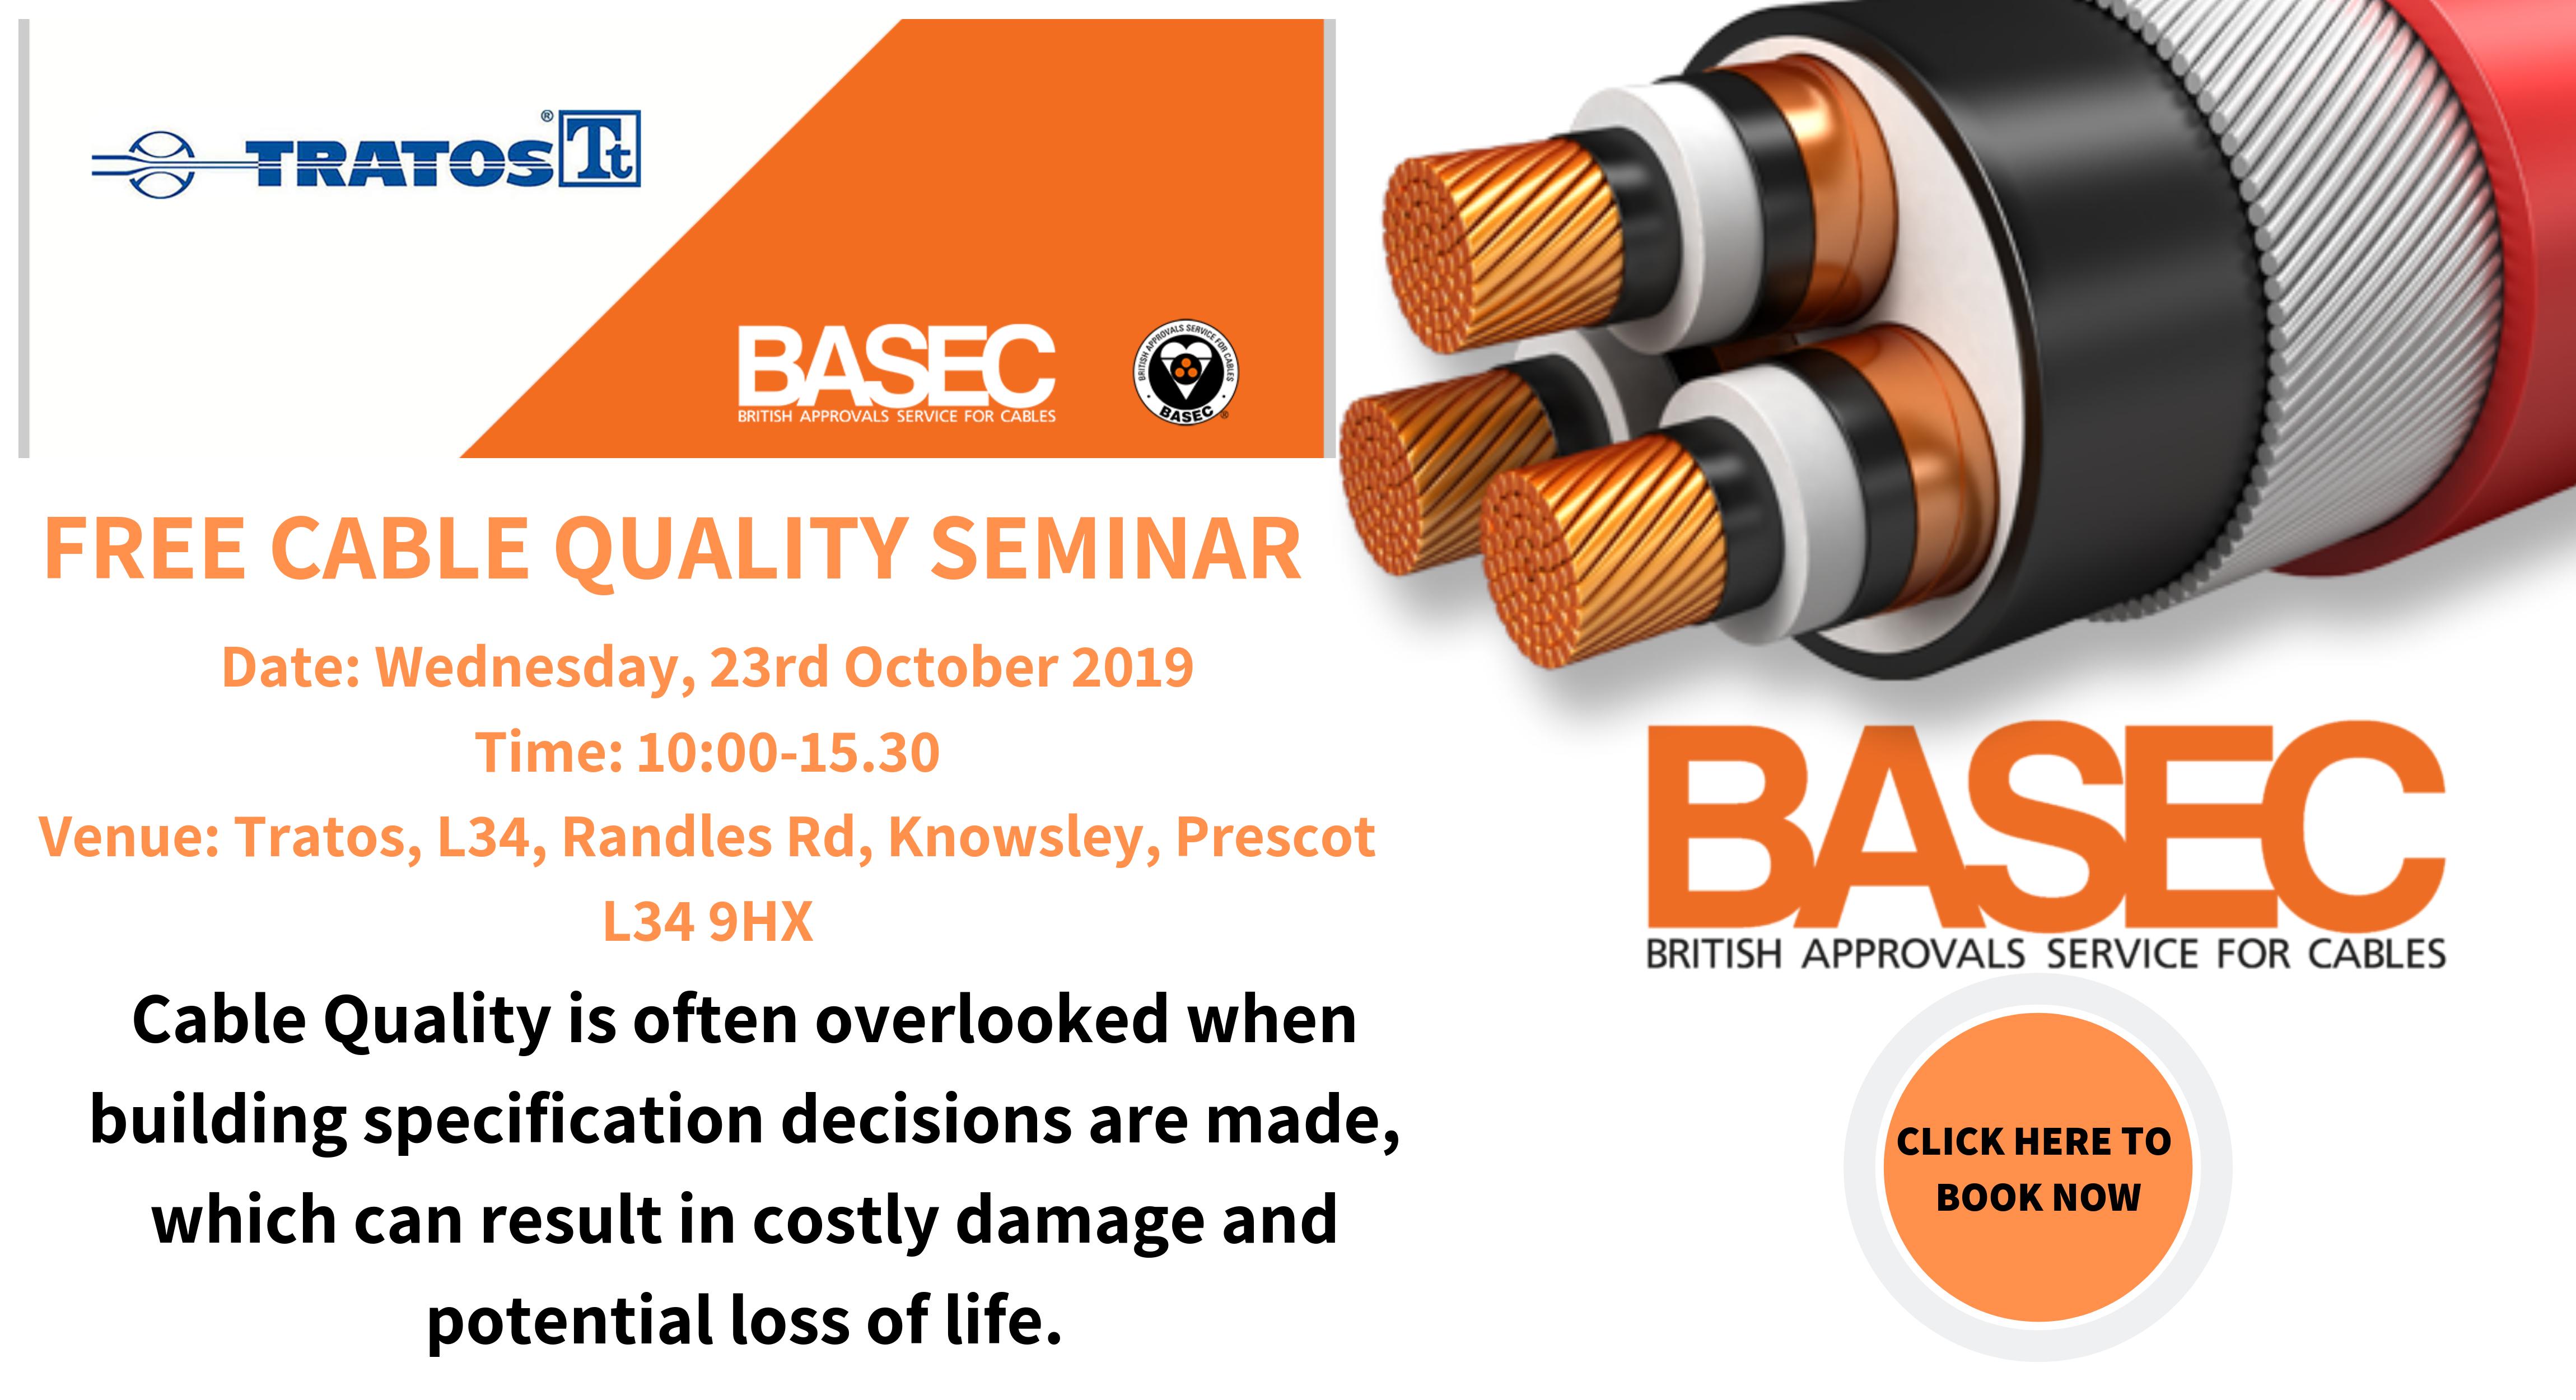 BASEC Cable Quality Seminar